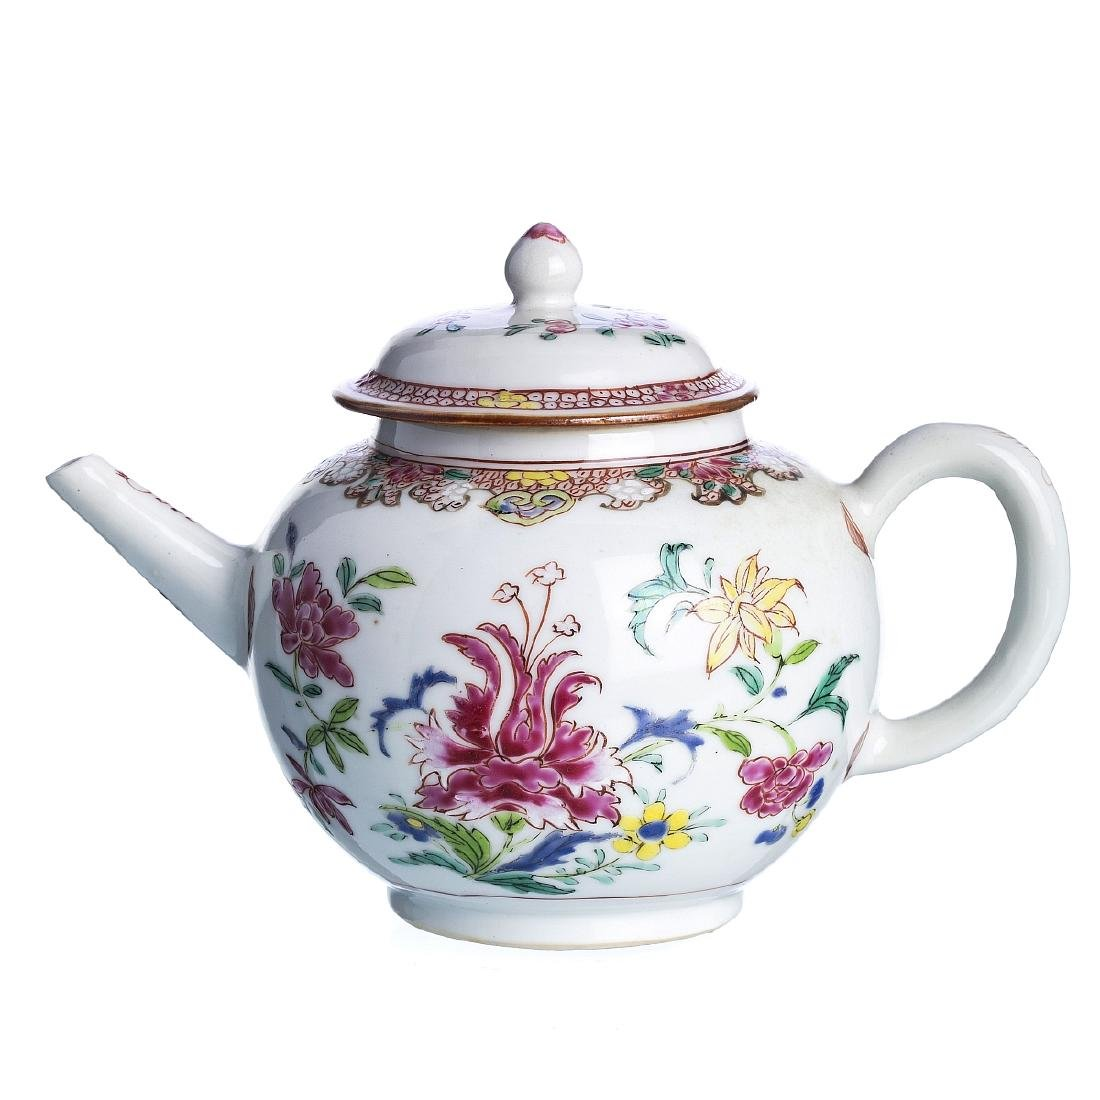 Chinese porcelain 'flowers' teapot, Qianlong